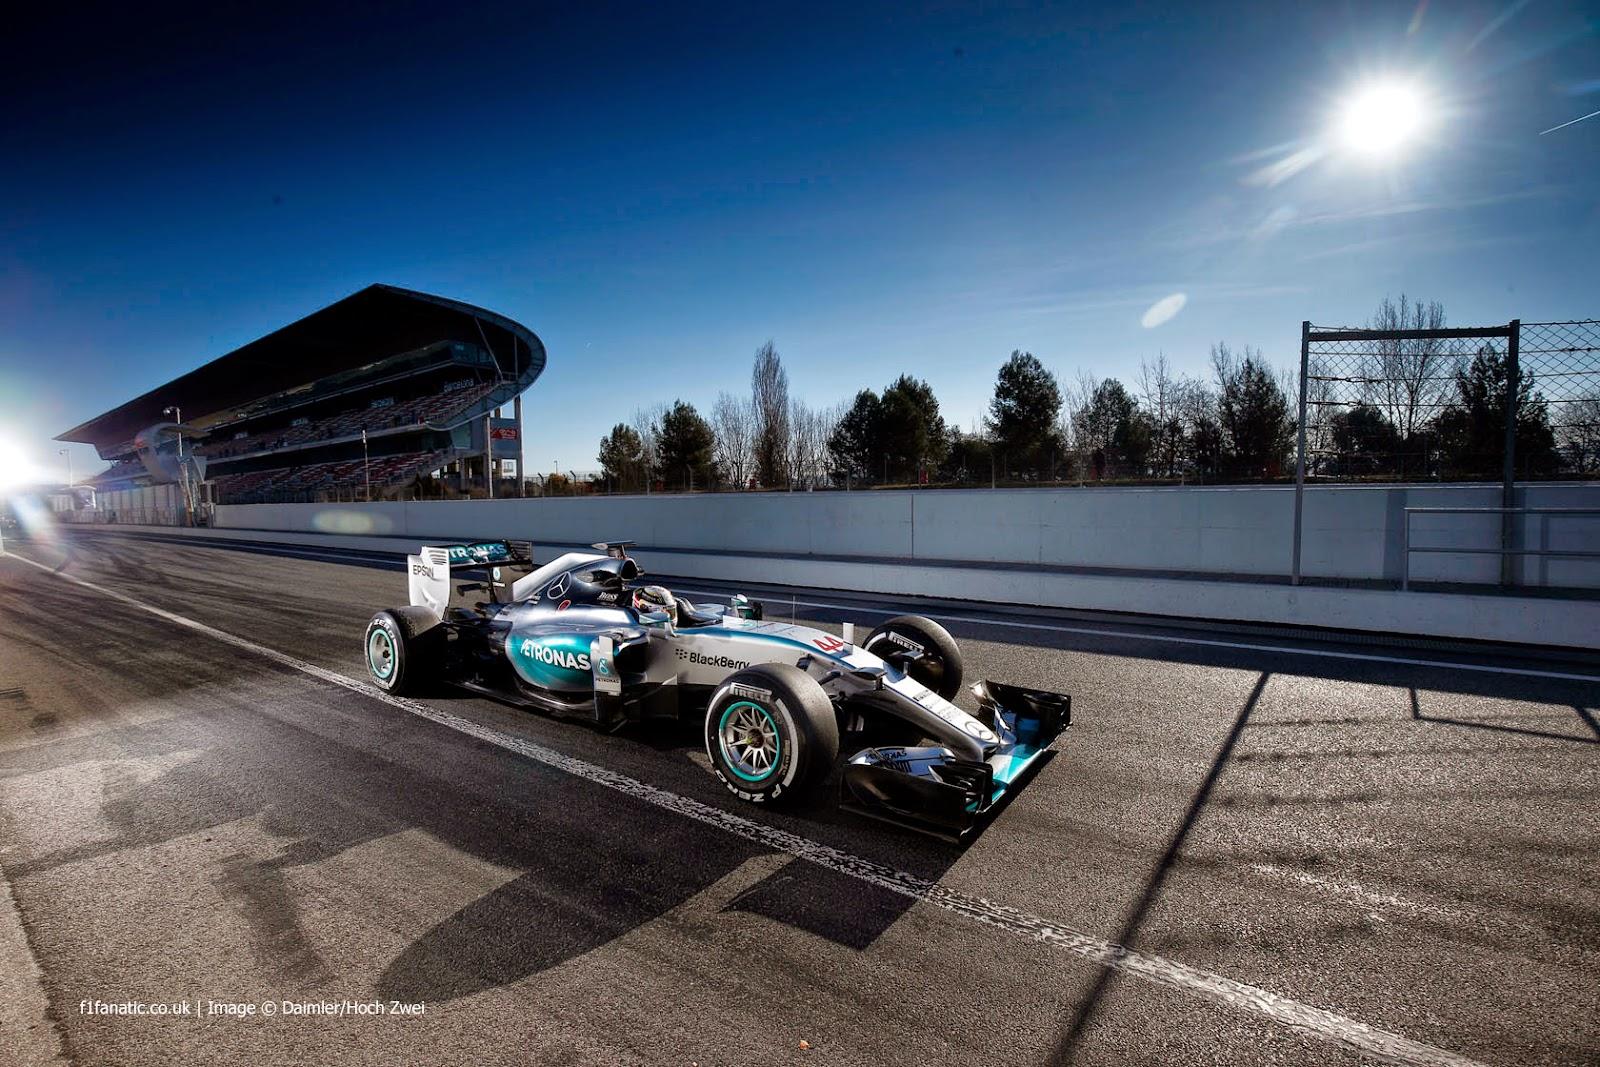 Mercedes Amg Petronas F1 Hd Hintergrundbilder 4k: [41+] Mercedes AMG Petronas Wallpaper On WallpaperSafari